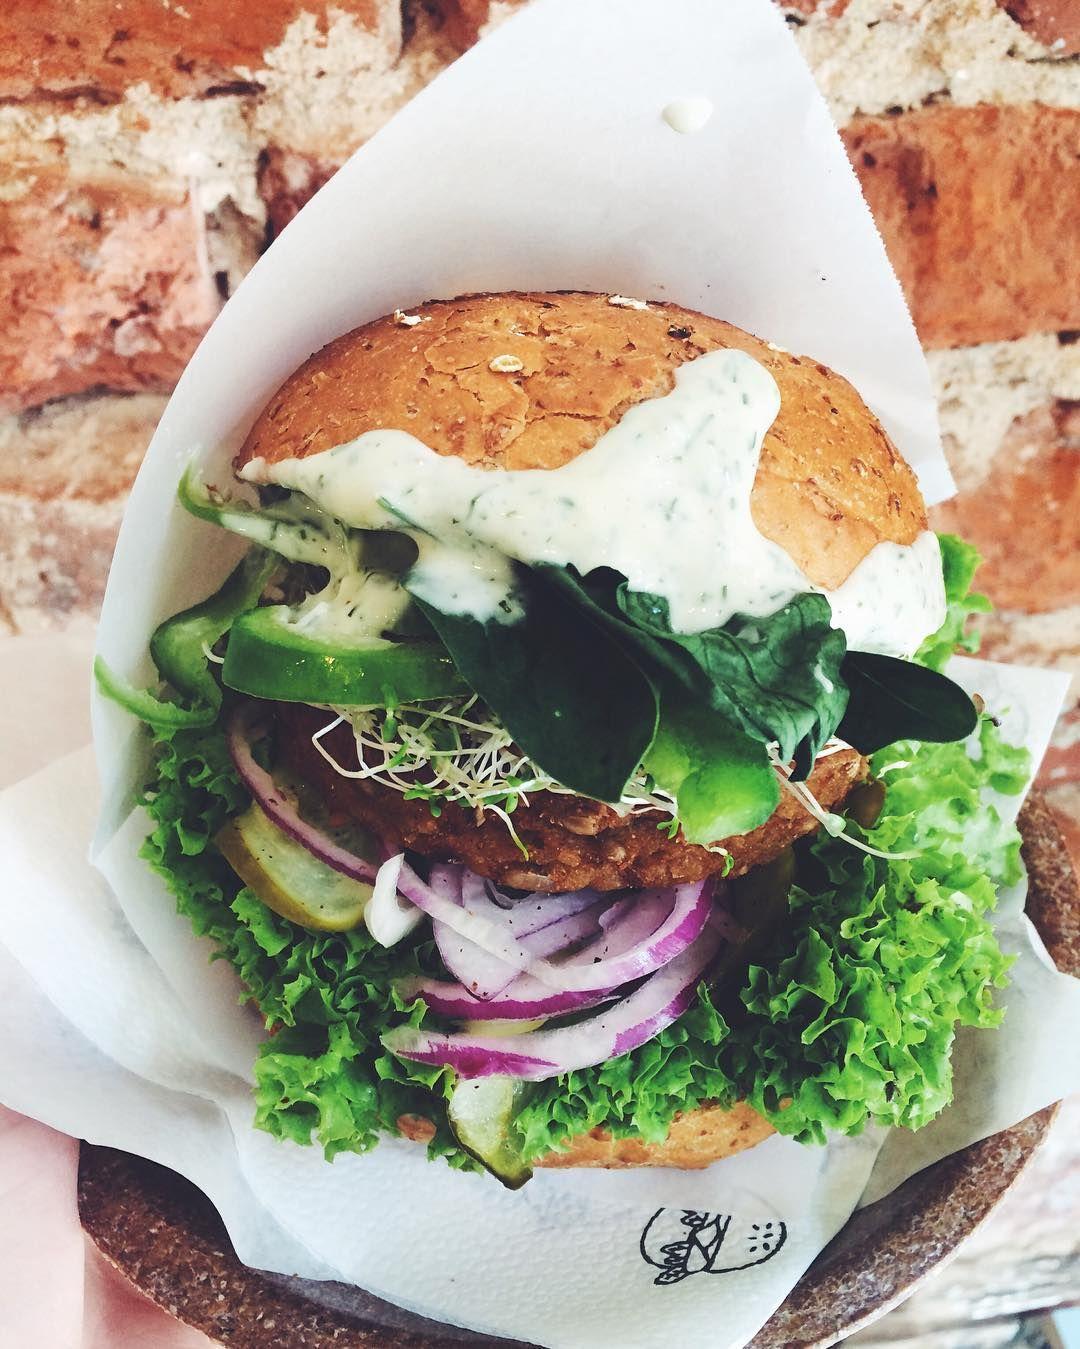 100 Vegan Burger Whole Wheat Bun With A Pumpkin And Sunflower Seed Pattie Vegan Dill Aioli Tomato Healthy Eating Recipes Vegan Burgers Vegan Burger Recipe